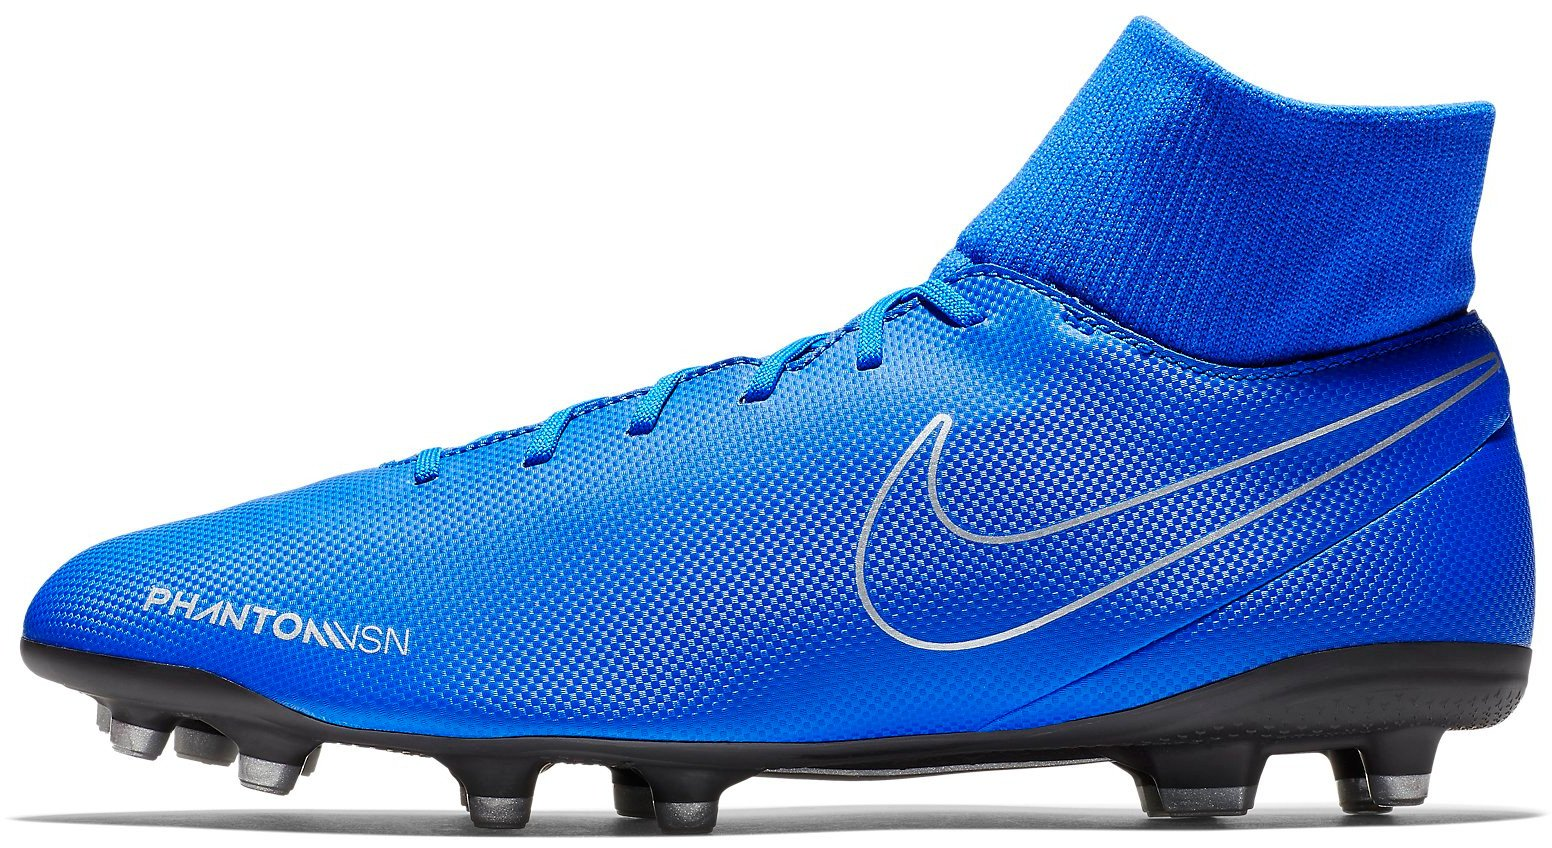 4d2c7a5d7 Football shoes Nike PHANTOM VSN CLUB DF FG MG - WPsoccer